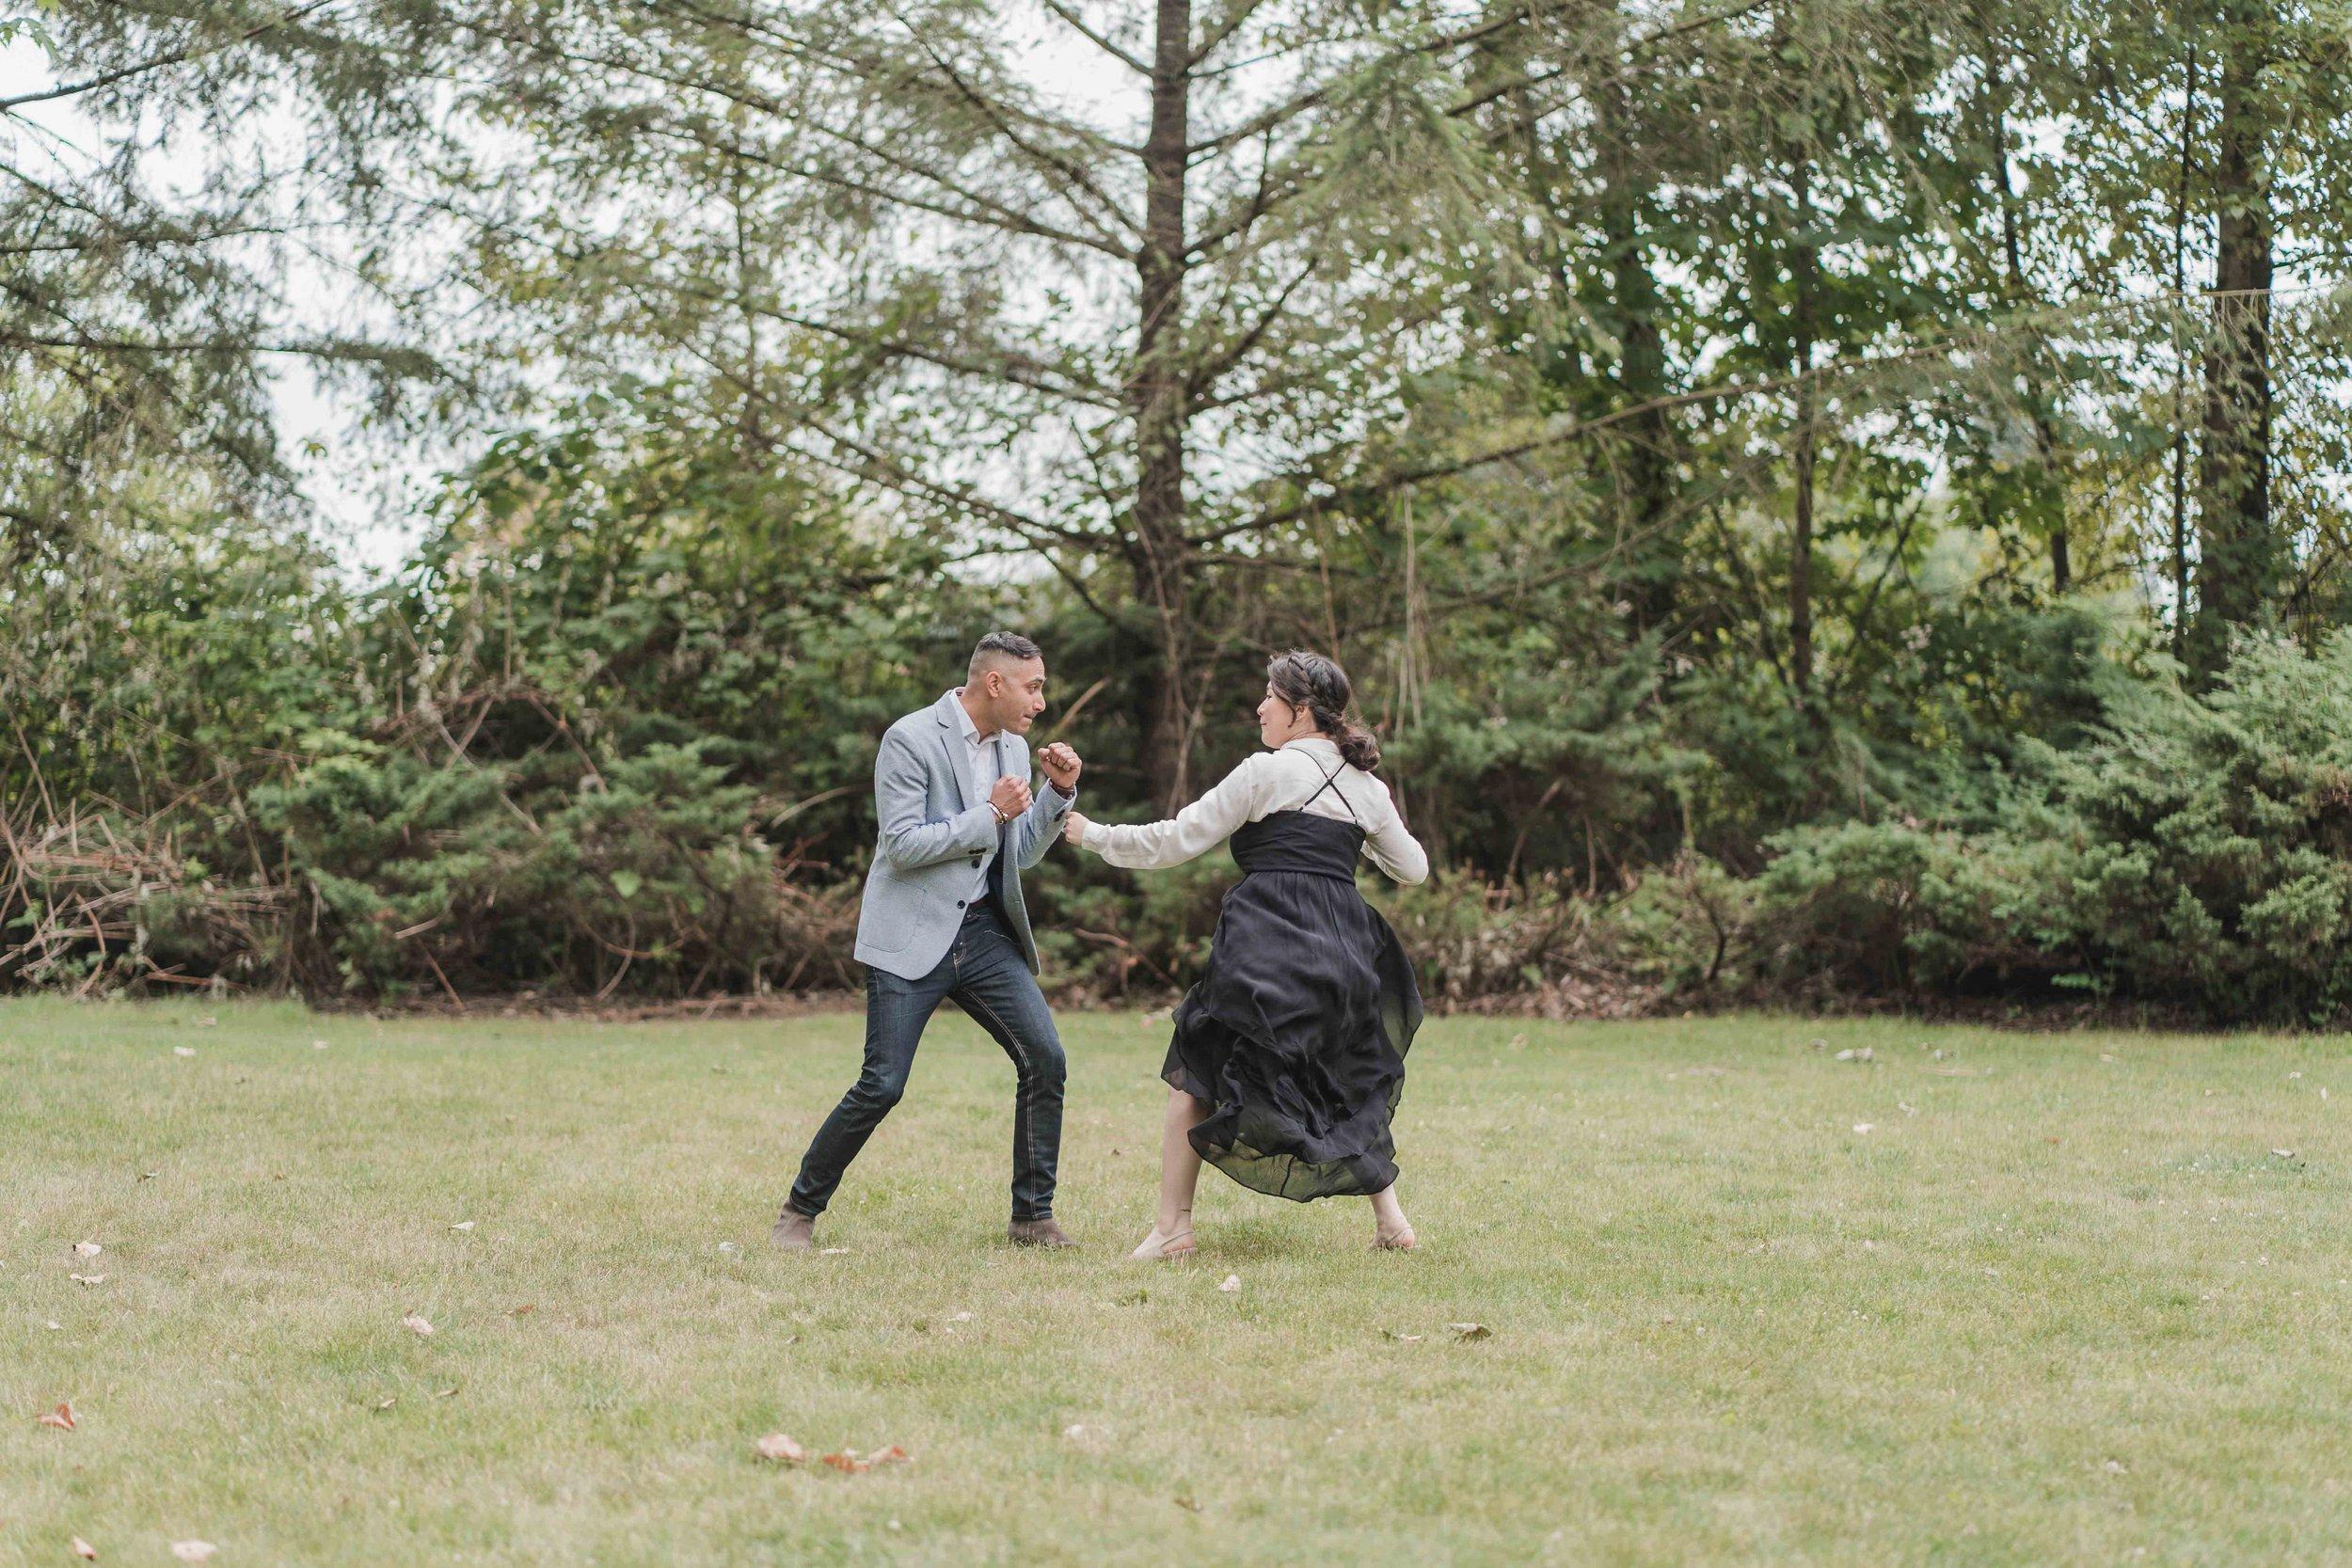 20190622 - Monika & Johnson Engagement - 0172.jpg